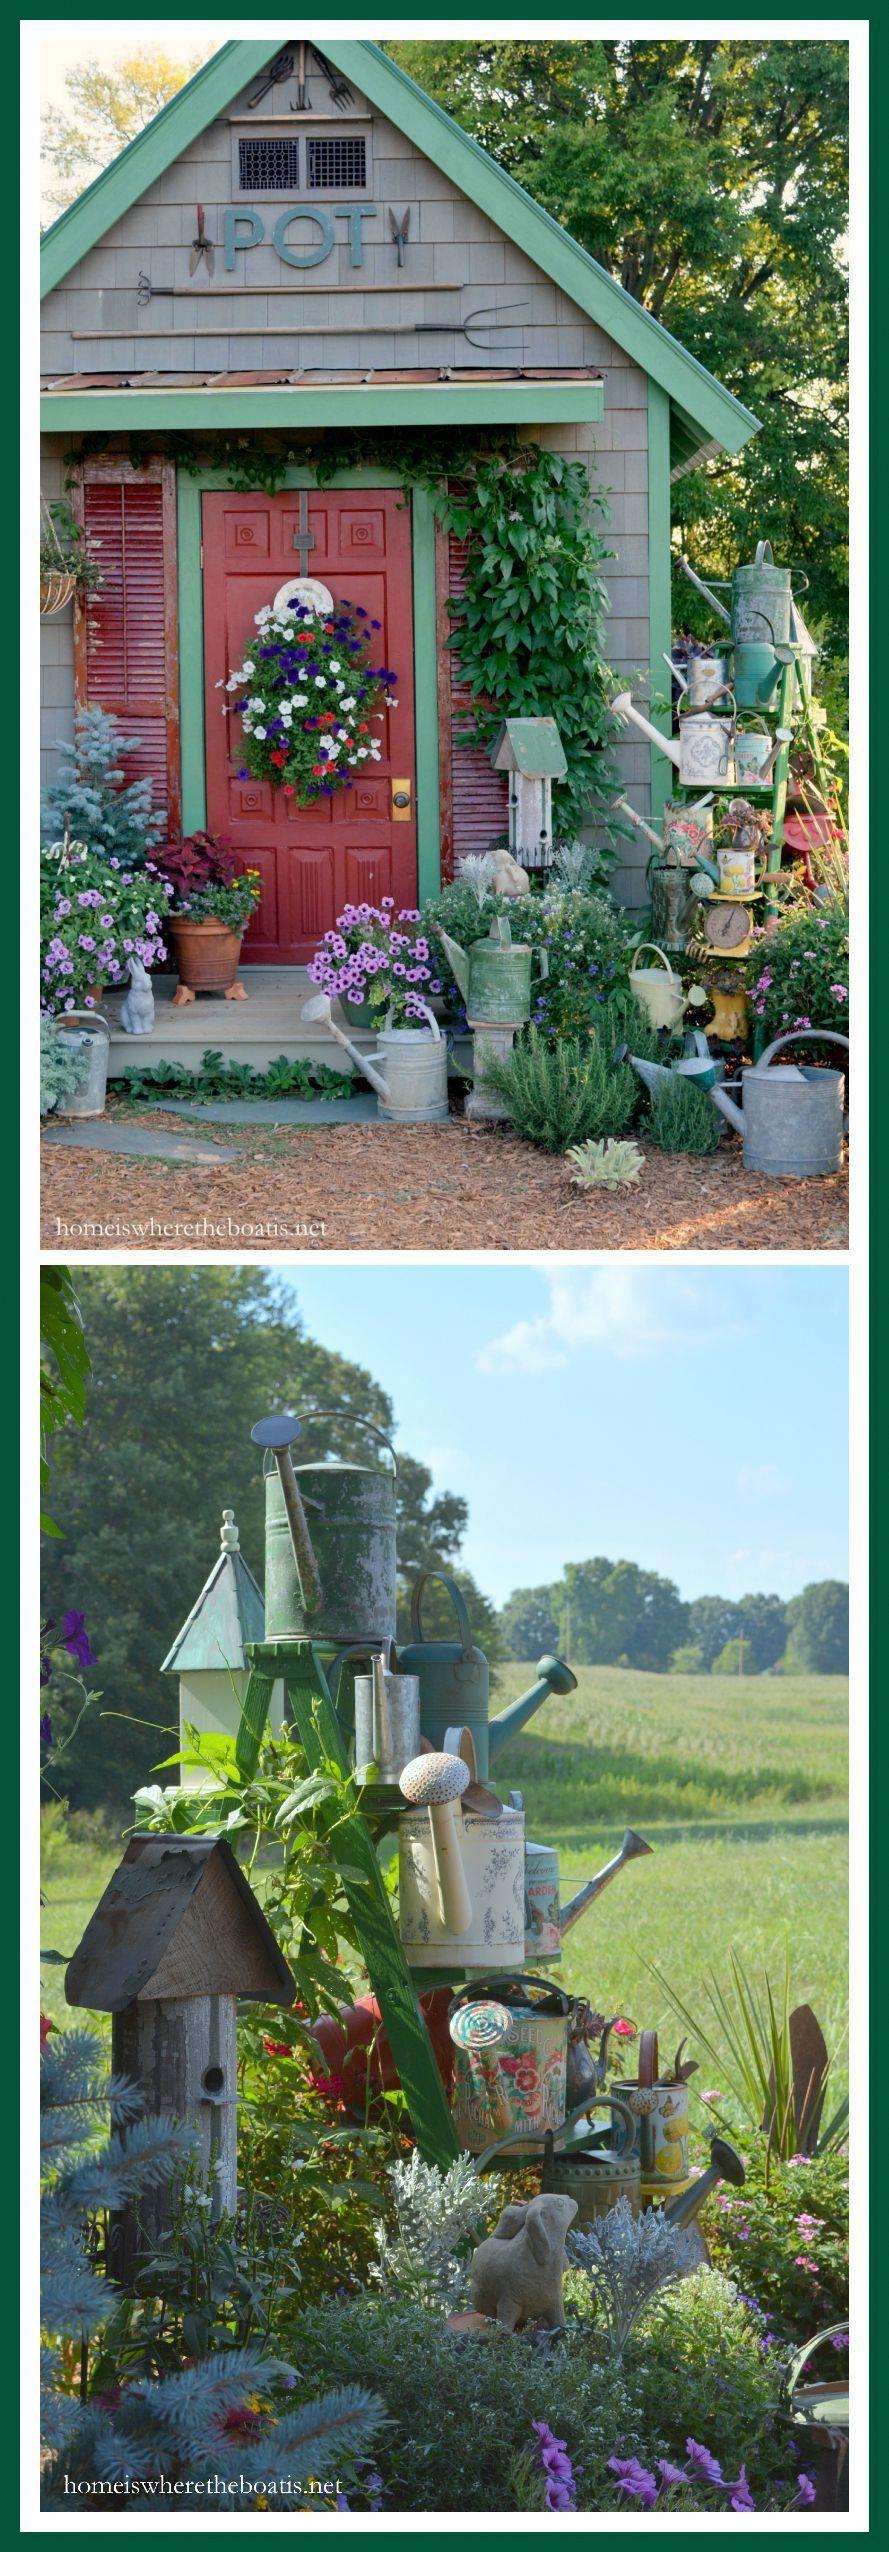 7ba894802e3b7fcc3dd3093c8412a6ac - University Of Maryland Master Gardener Handbook